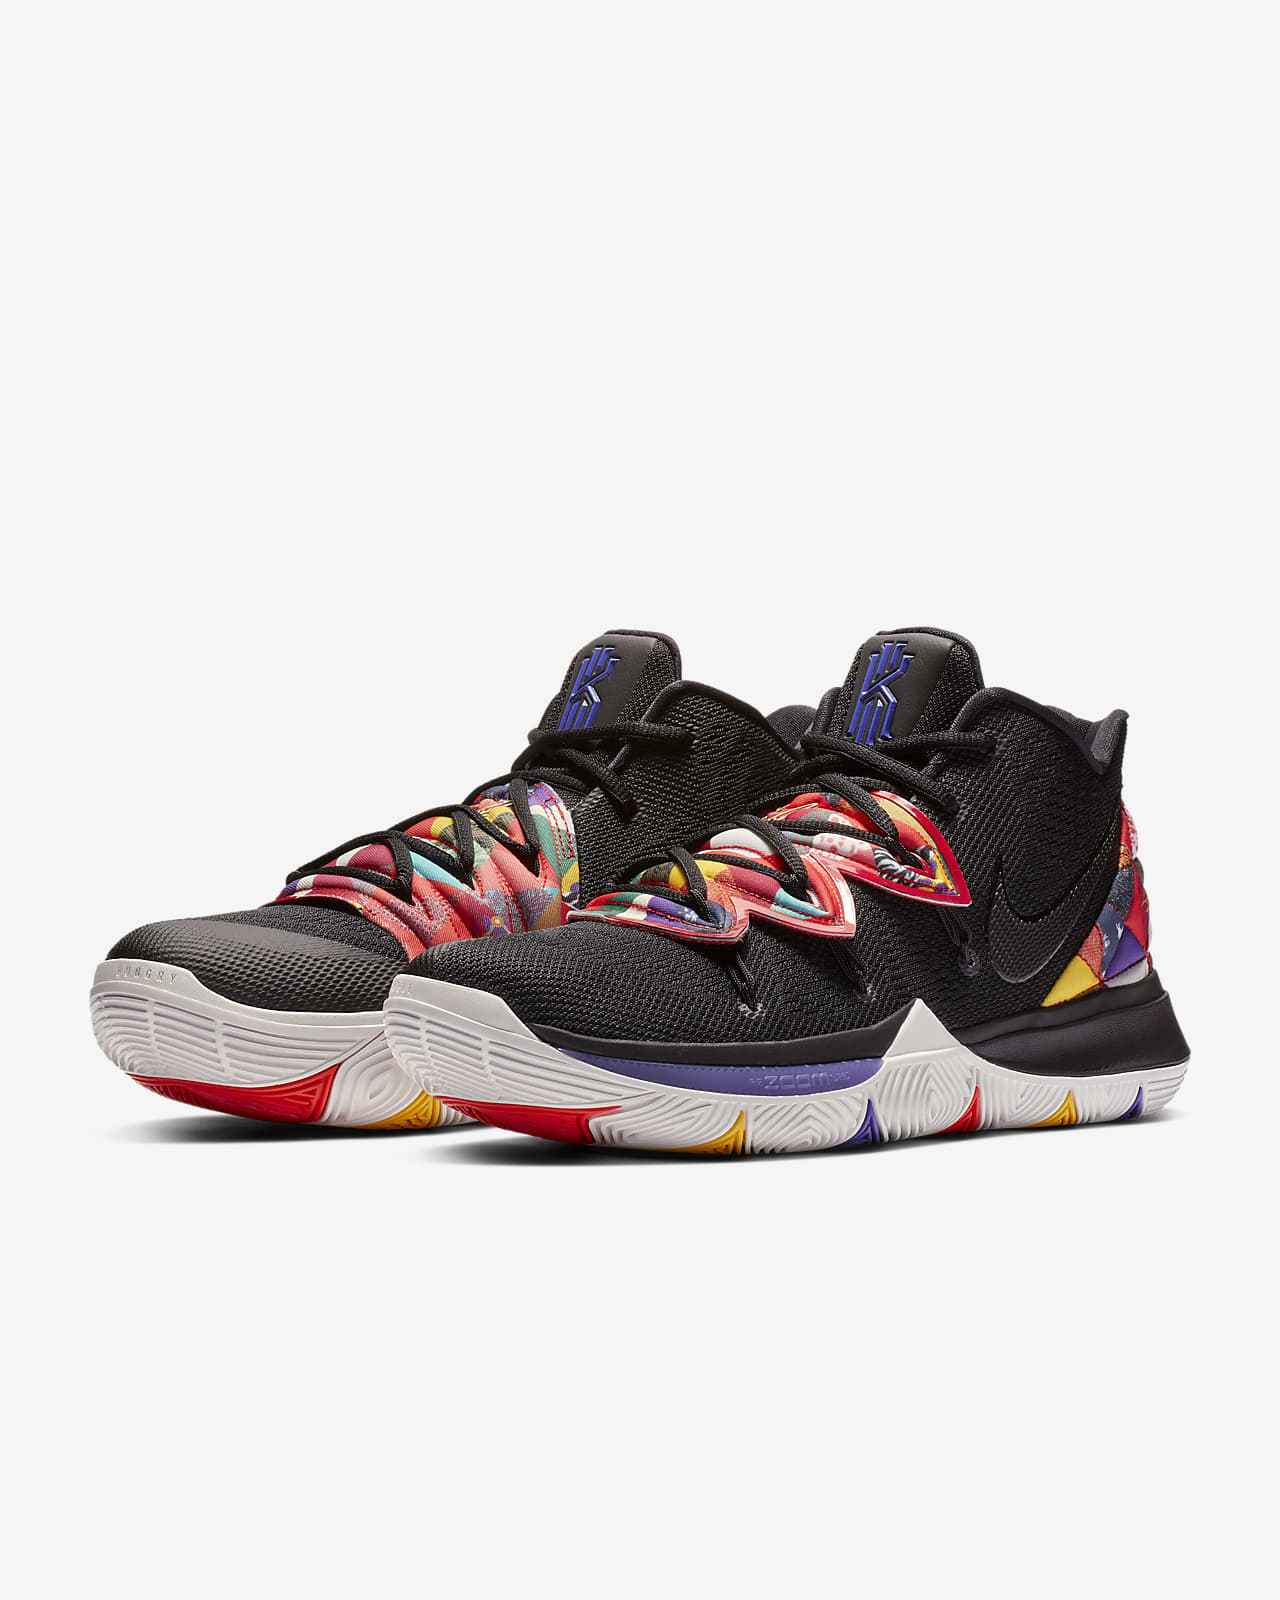 NIKE KYRIE 5 x SpongeBob EP NBA basketball shoes for